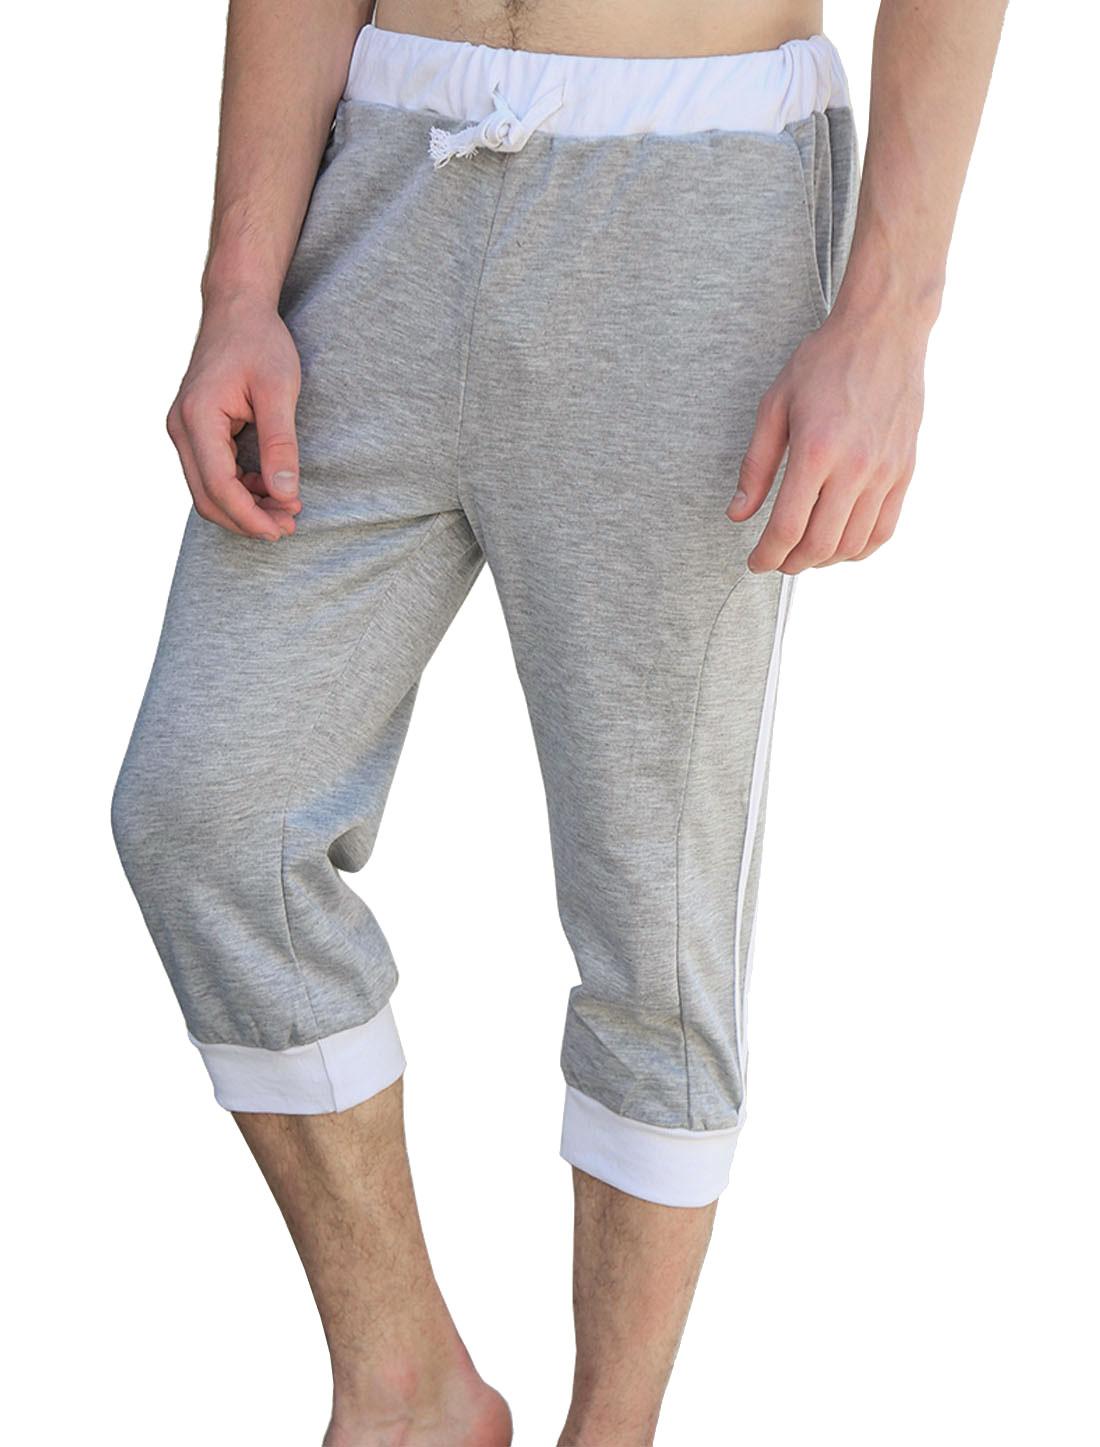 Men Drawstring Waist Pockets Stripes Casual Capris Pants Light Gray White W36